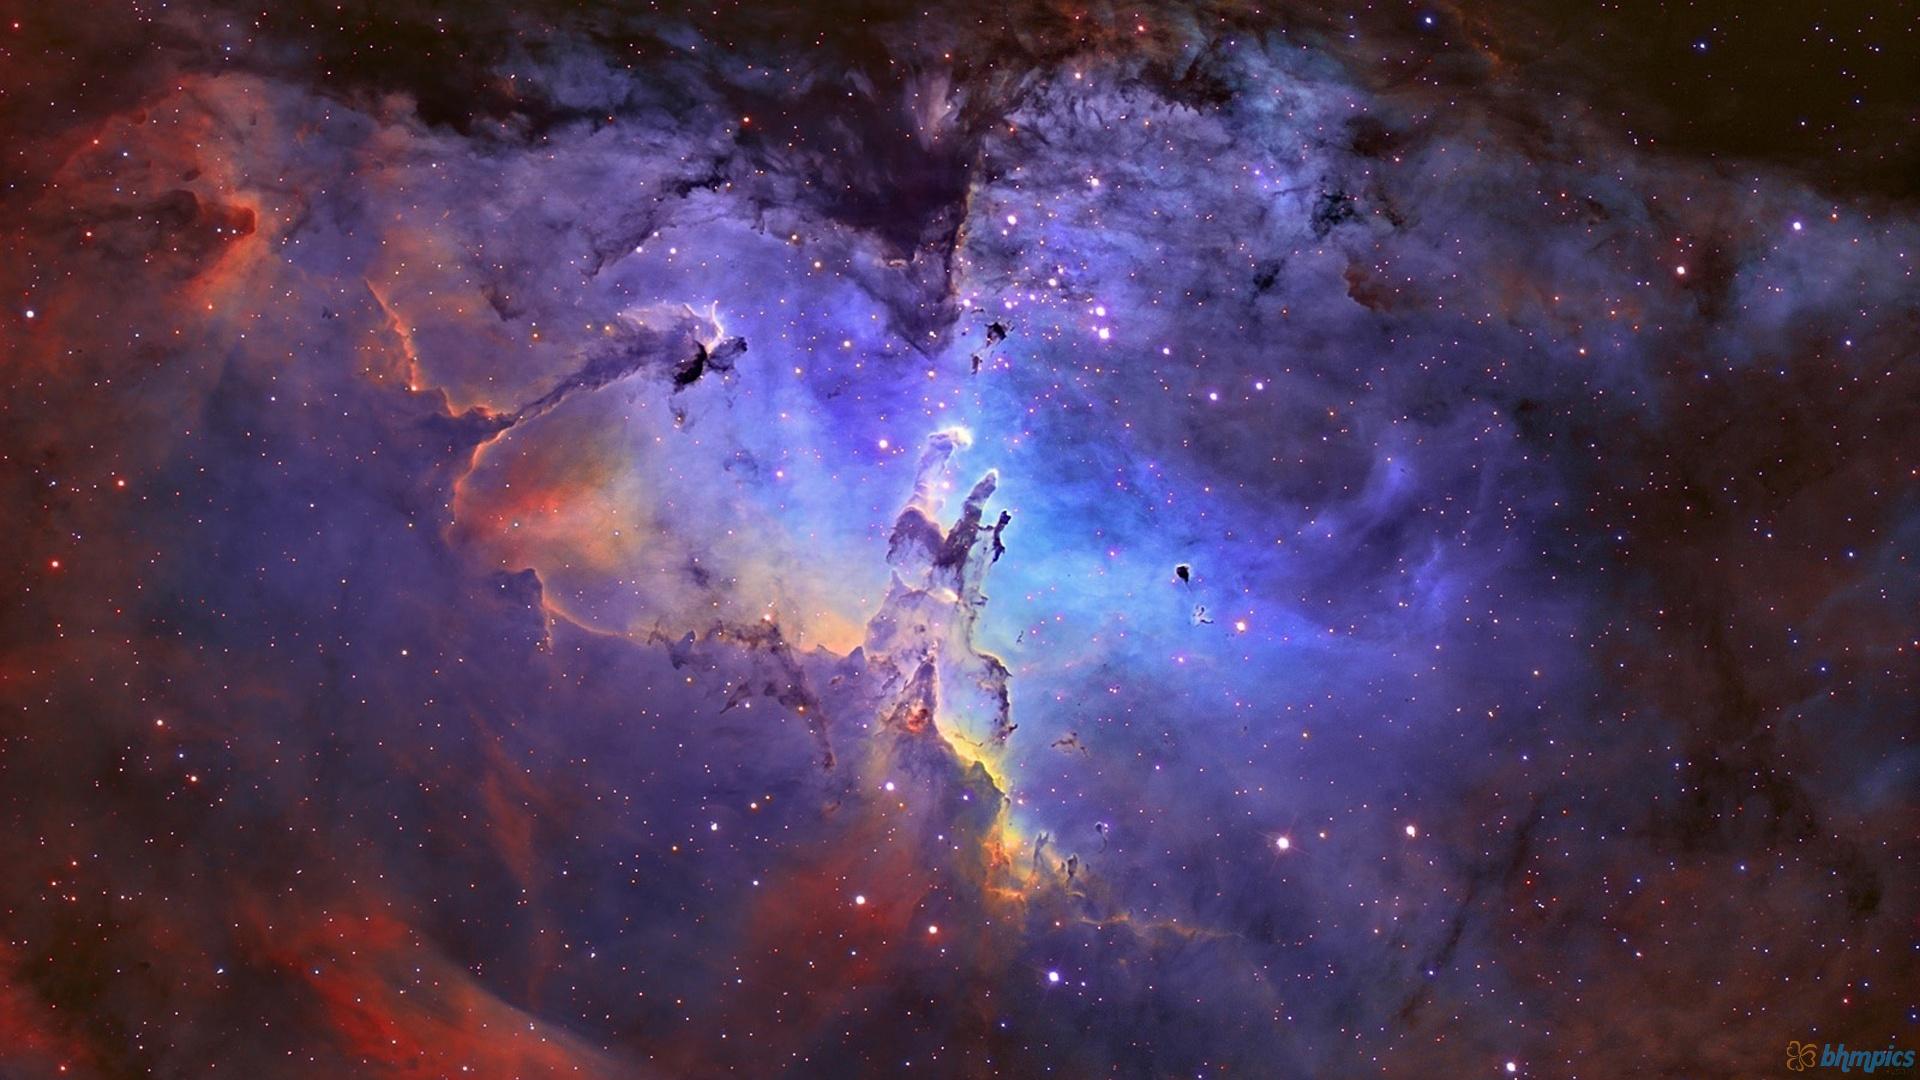 Great Wallpaper High Resolution Nebula - Nebula-Wallpaper-034  2018_96792.jpg